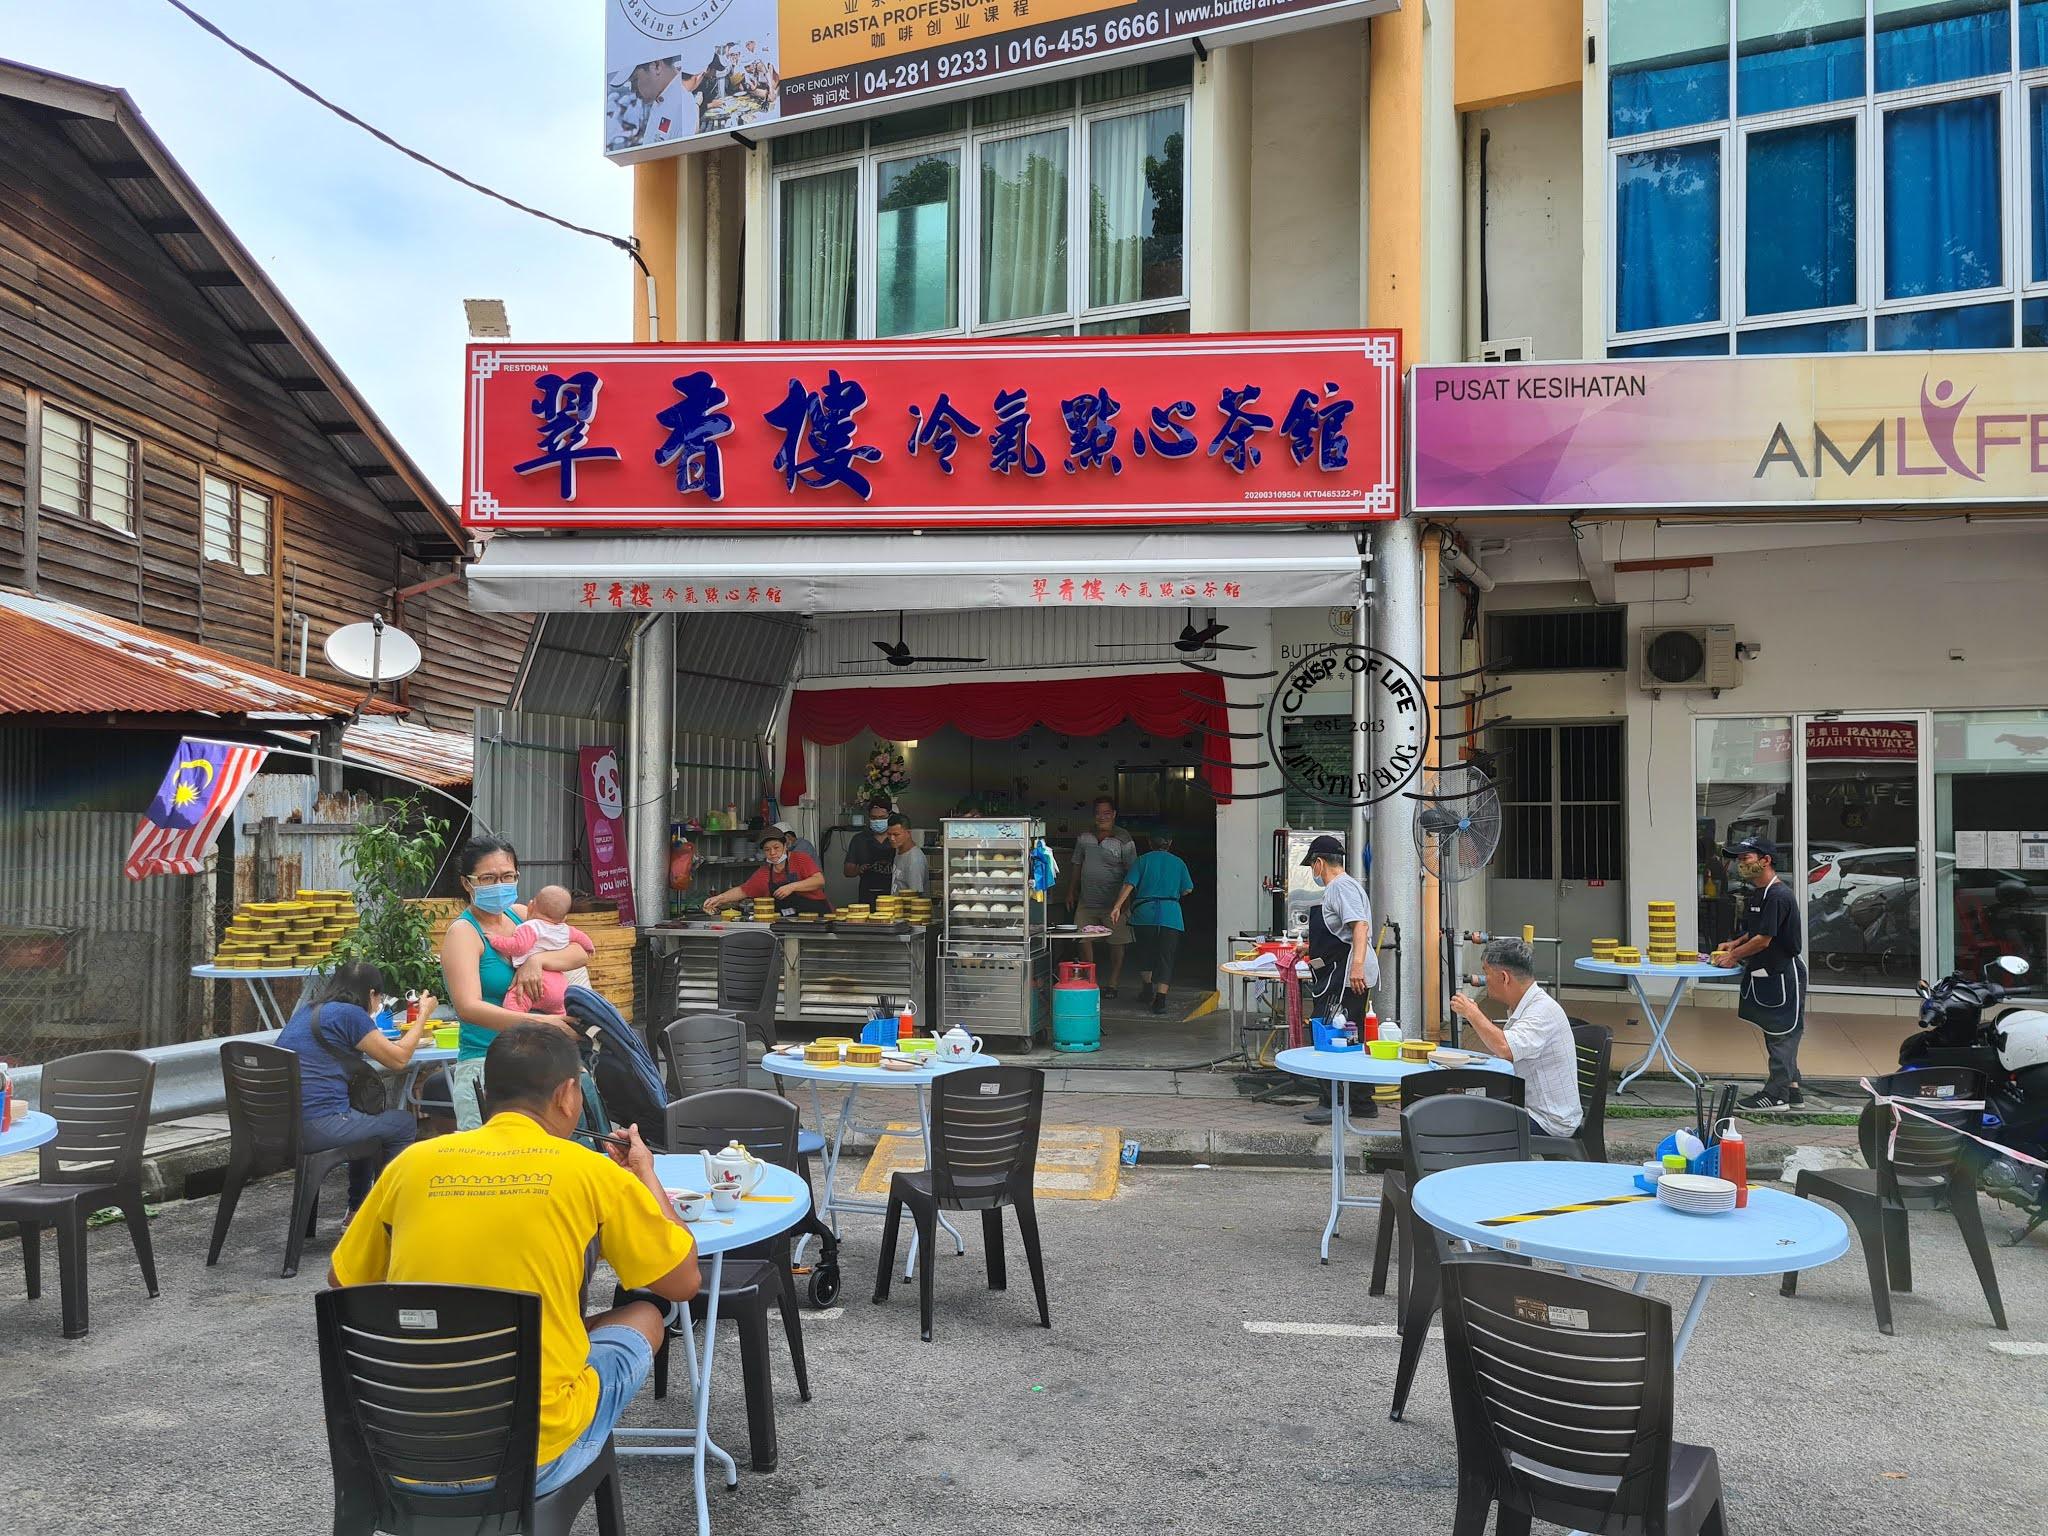 Jalan Perak Dim Sum - Cui Xiang Lou Dim Sum 翠香楼点心